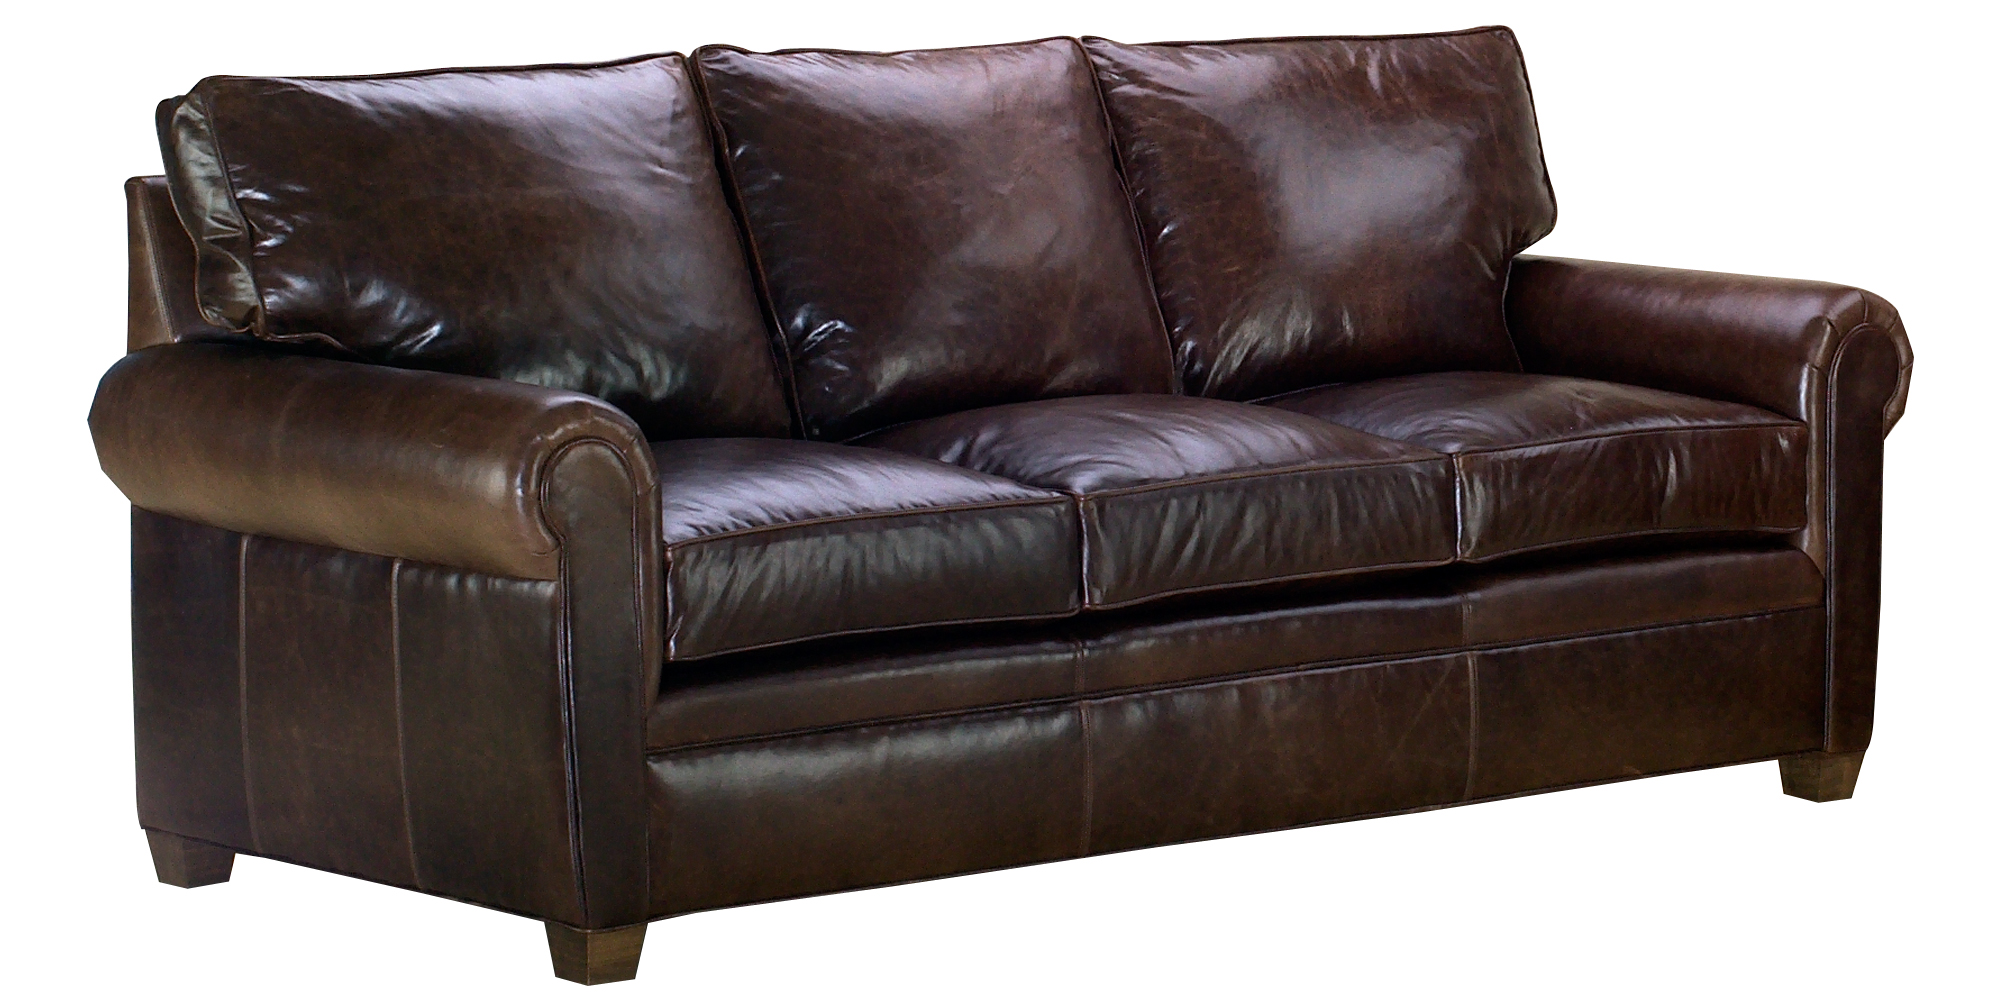 leather furniture rockefeller rolled arm sofa set AGKEAGA